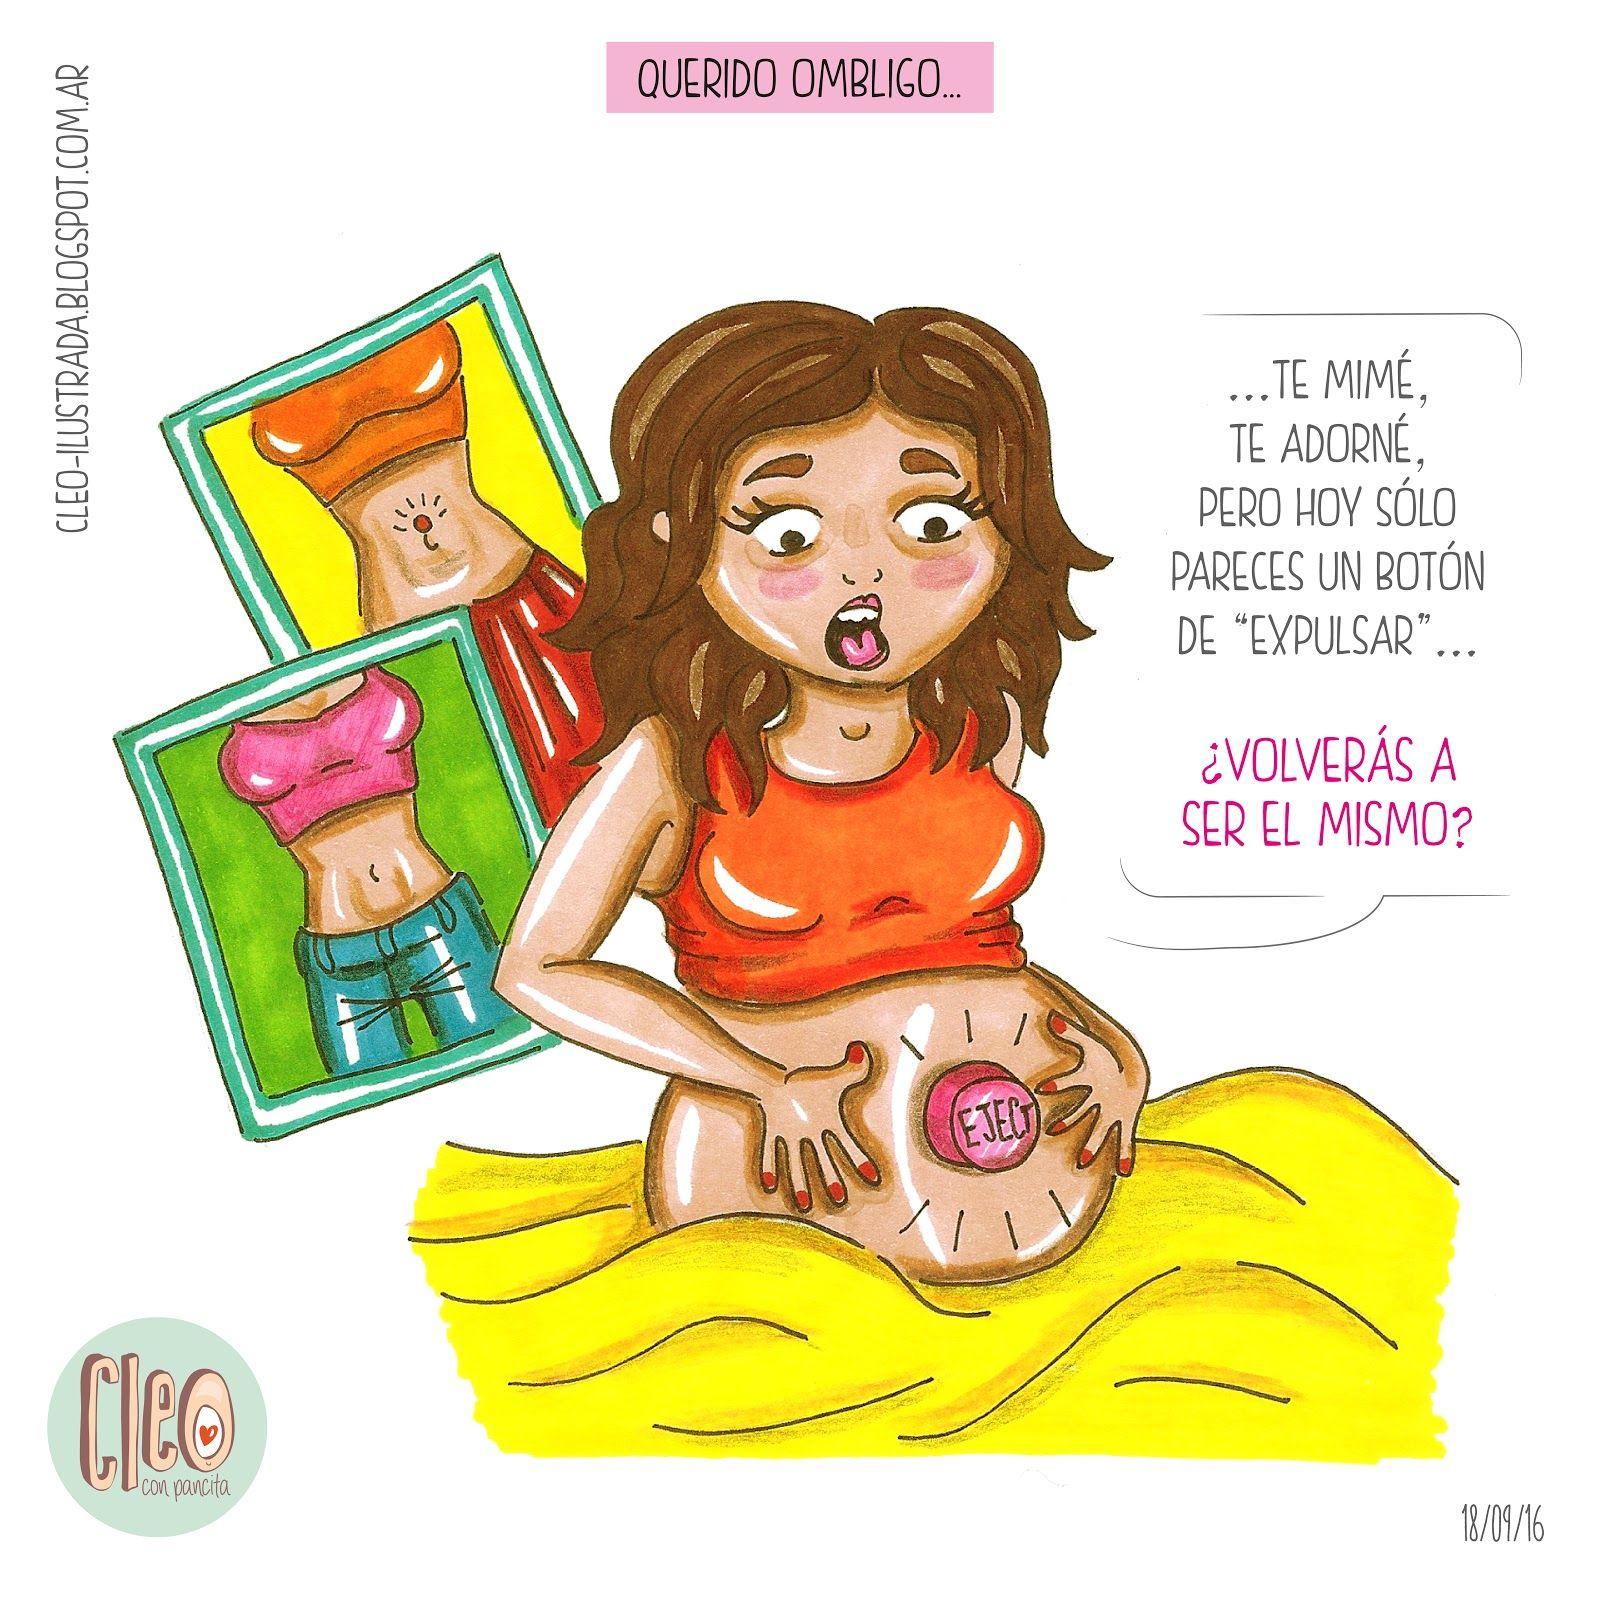 Querido Ombligo Embarazo Embarazo Divertido Embarazada Caricatura